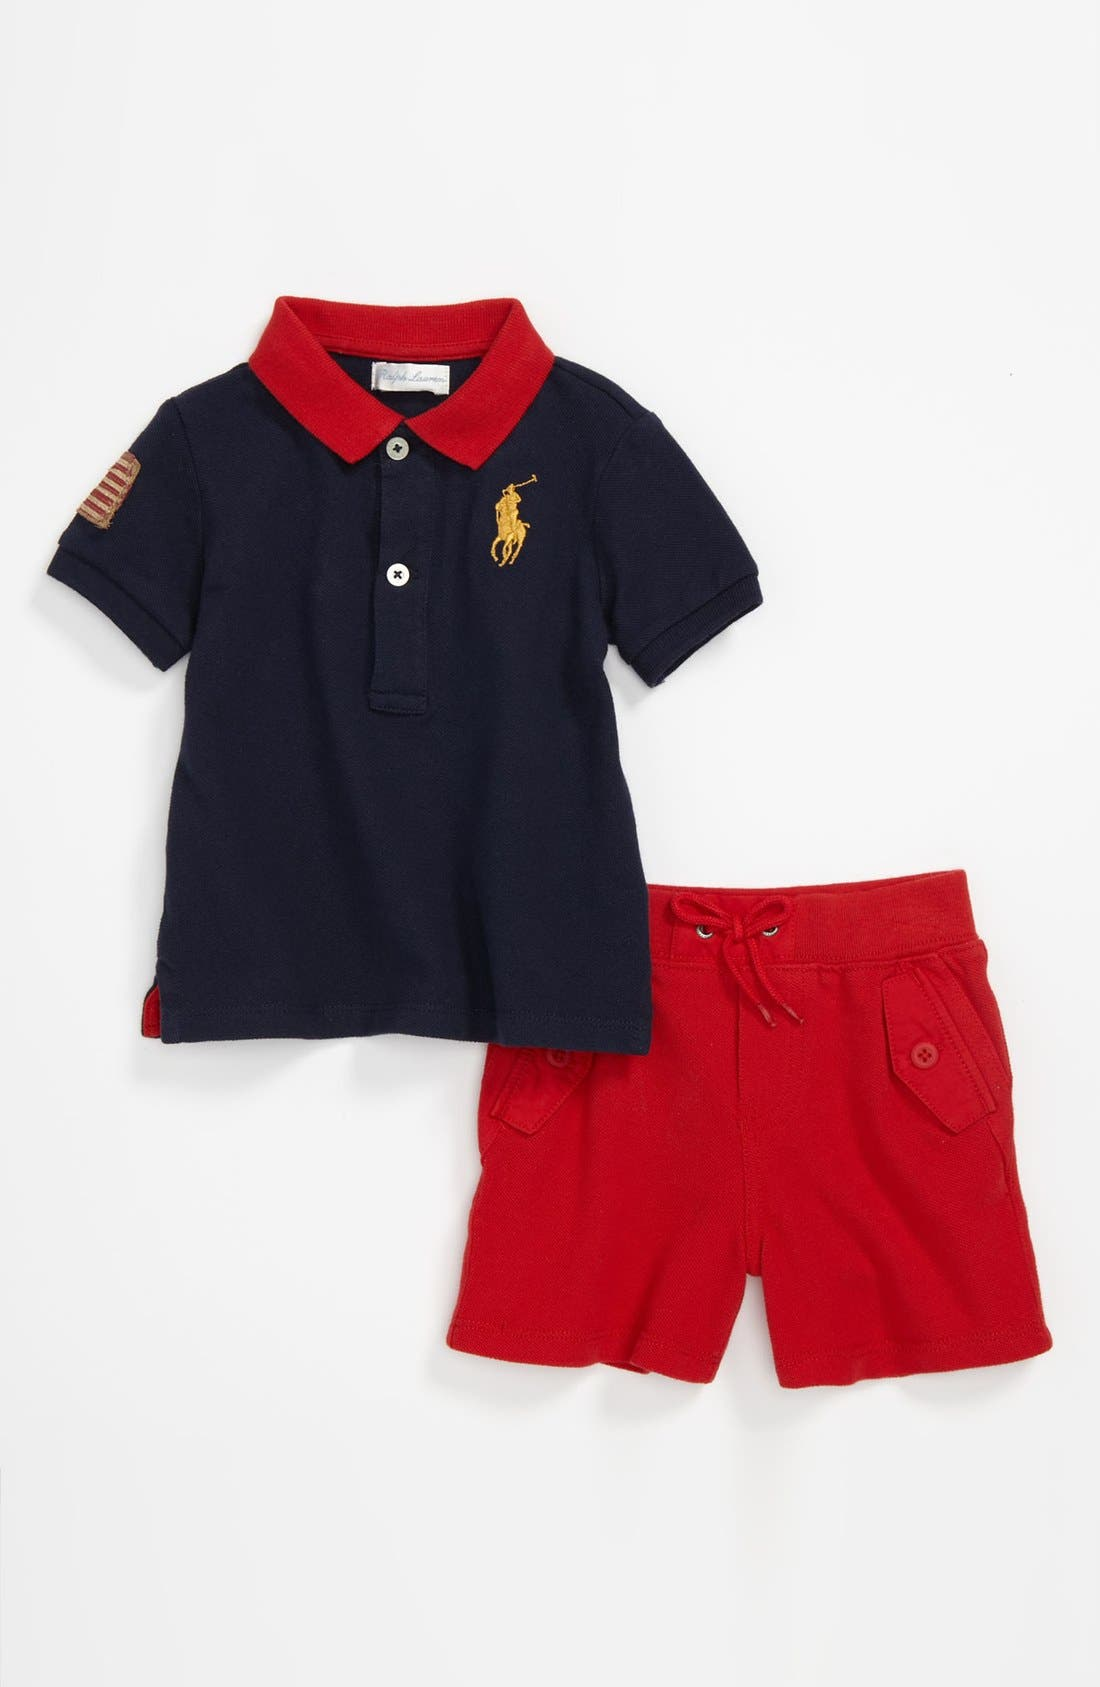 Main Image - Ralph Lauren Polo & Shorts (Baby)